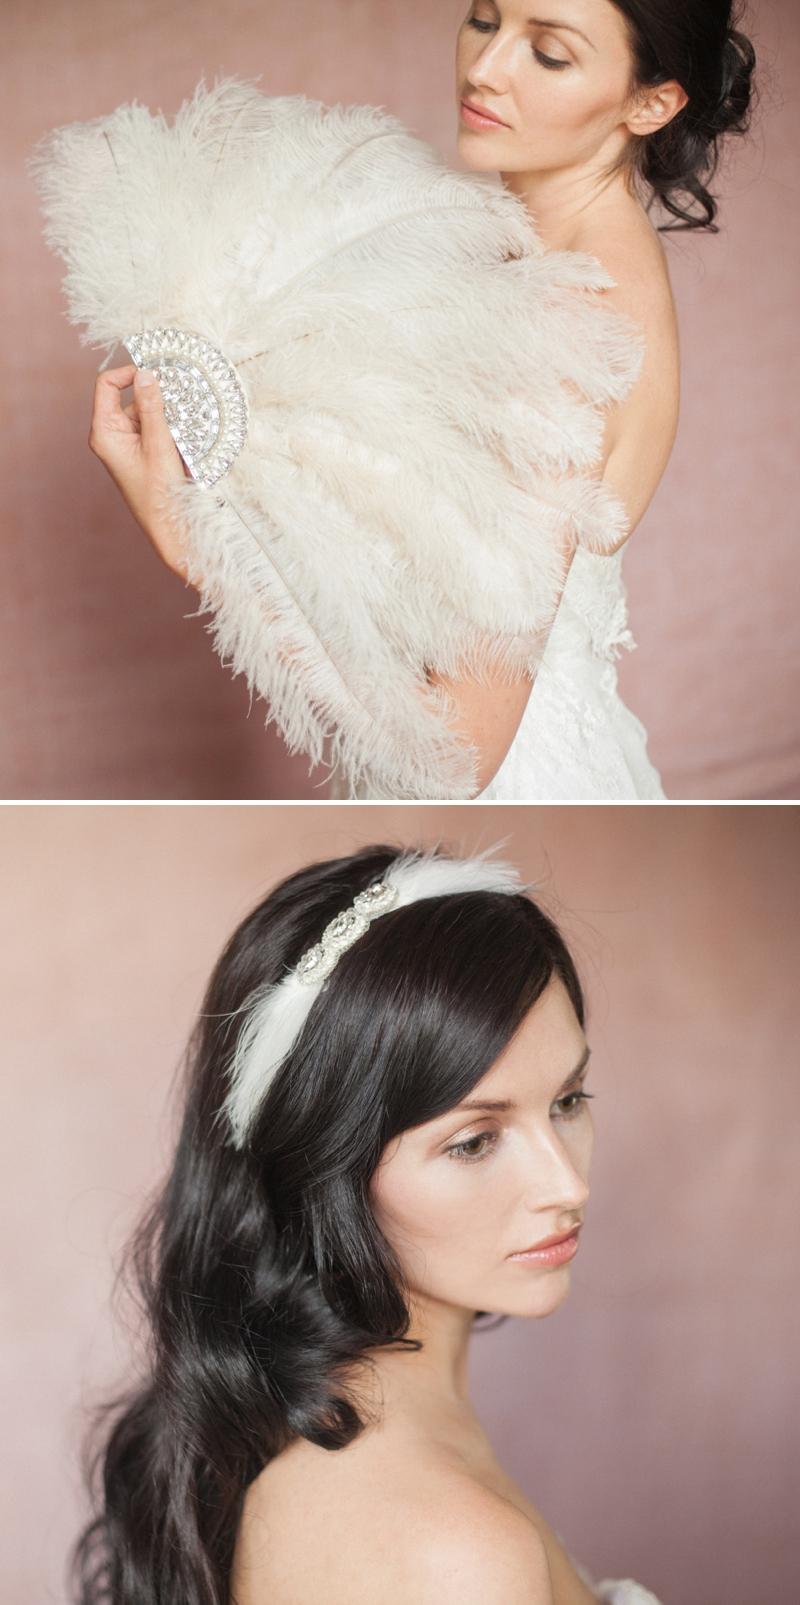 Britten 2014 Liberte Collection vintage inspired bridal wedding accessories headpieces_0154